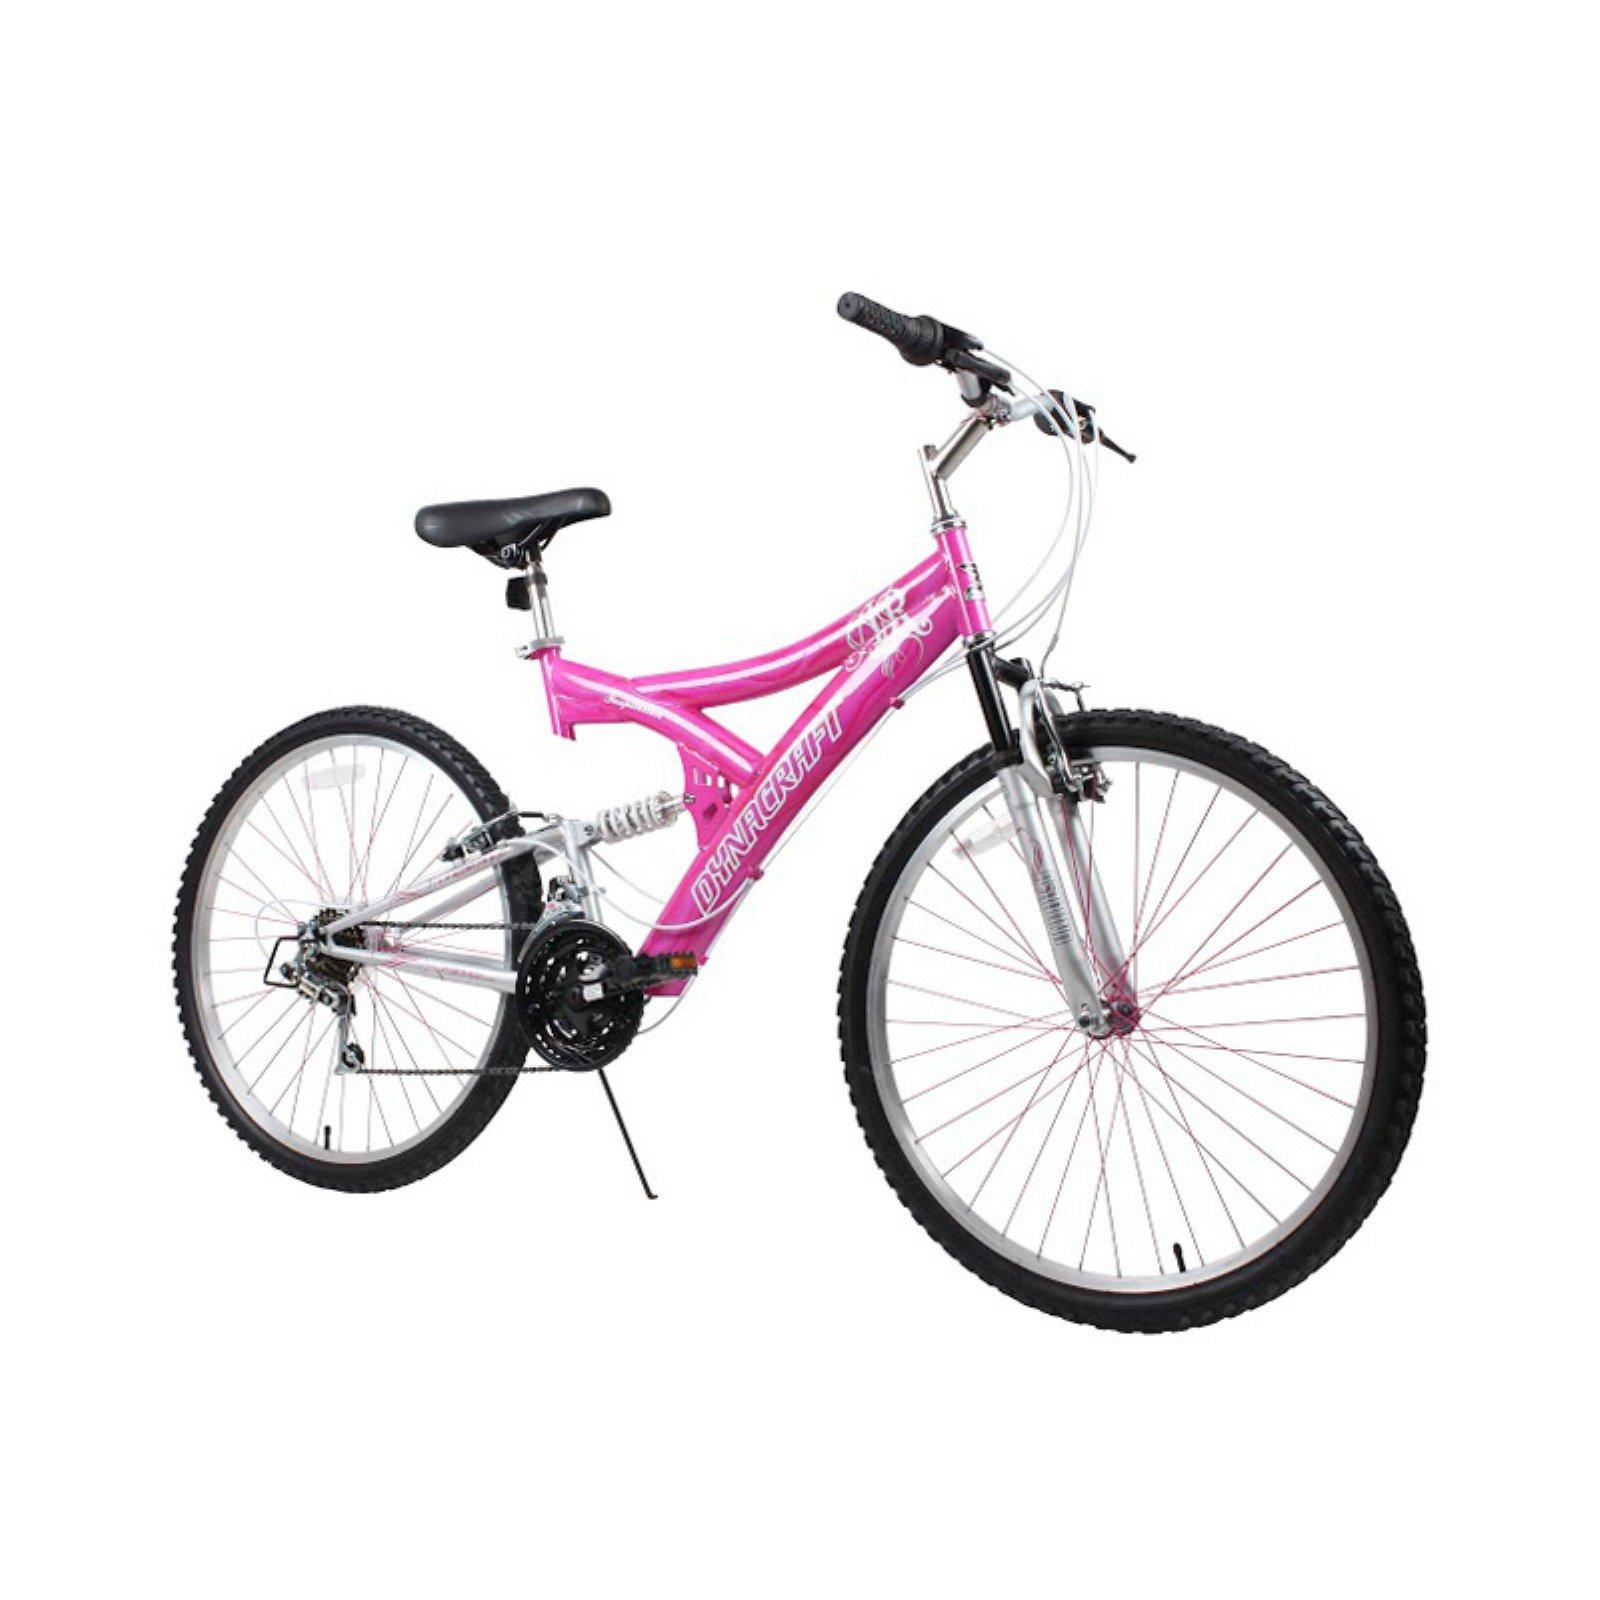 "26"" Dynacraft Air Blast Women's Mountain Bike"